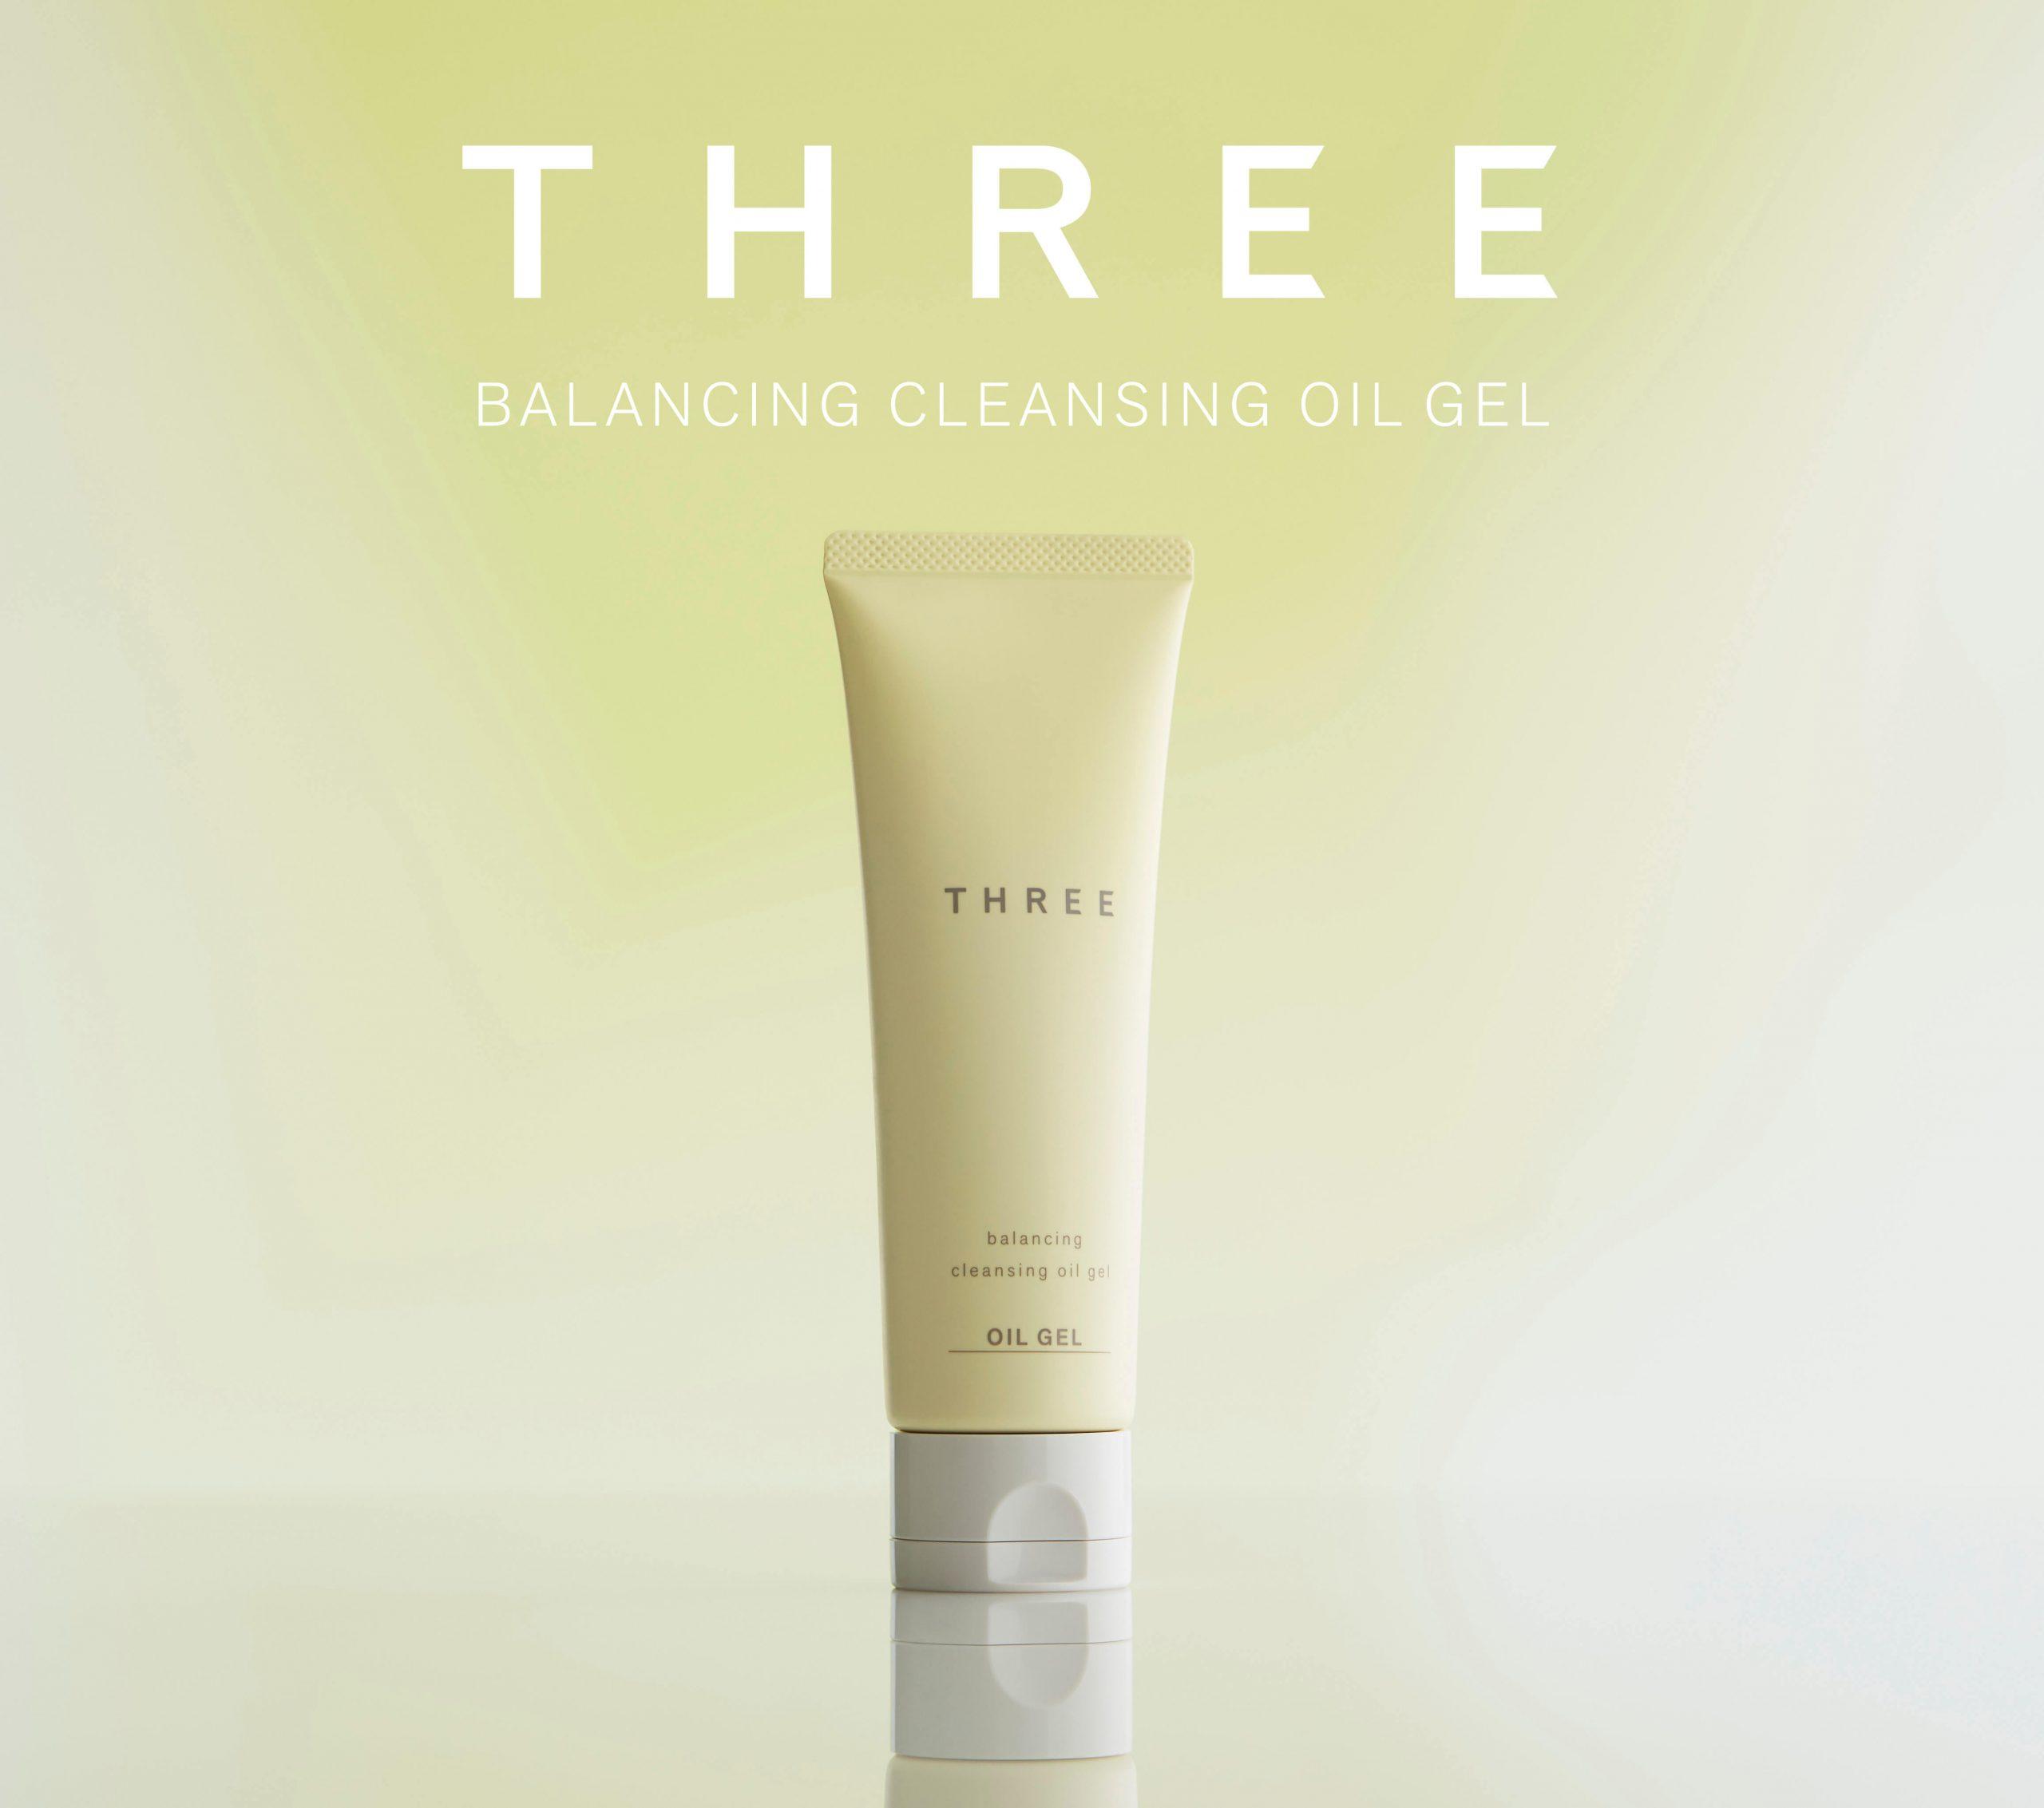 「THREE」毛穴の汚れまでするんとオフ新発想のクレンジングオイルジェル